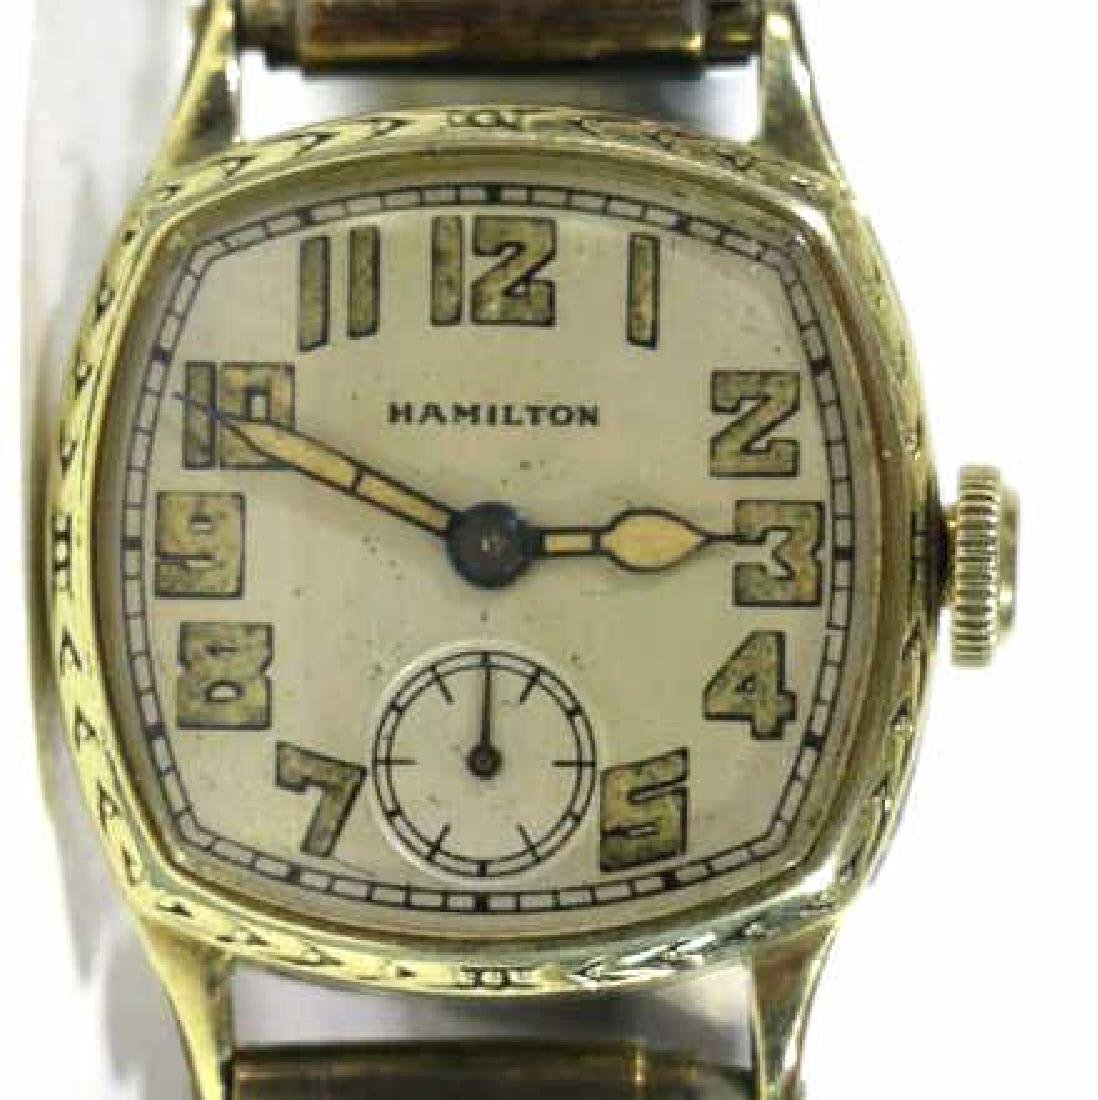 HAMILTON VINTAGE GOLD MEN'S WATCH - 2